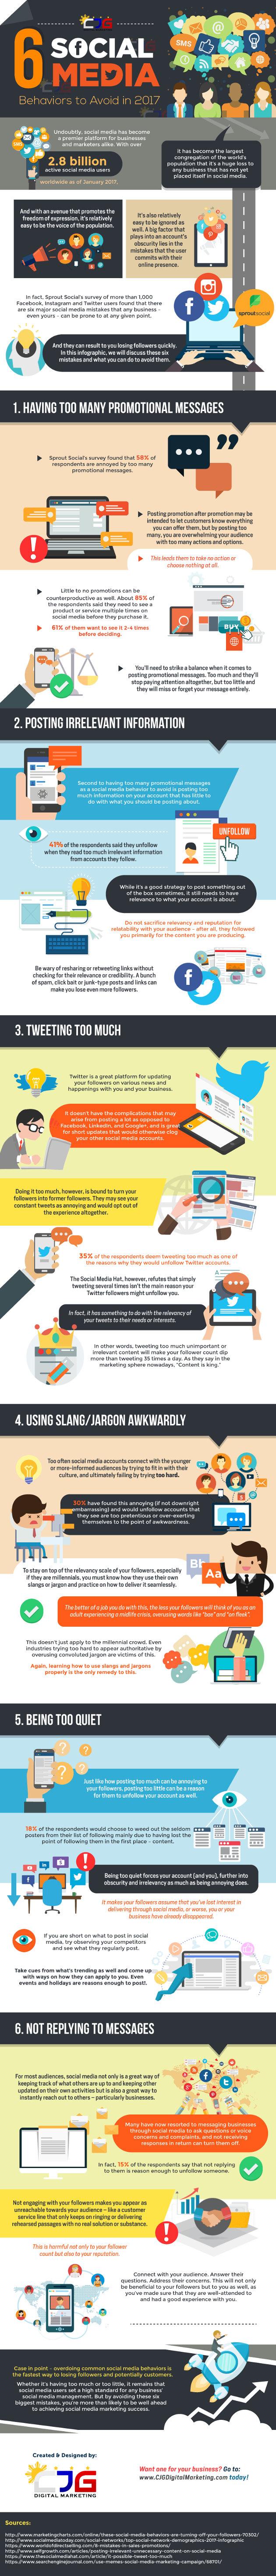 Social Media Behaviors Your Brand Needs to Avoid in 2017 [Infographic]